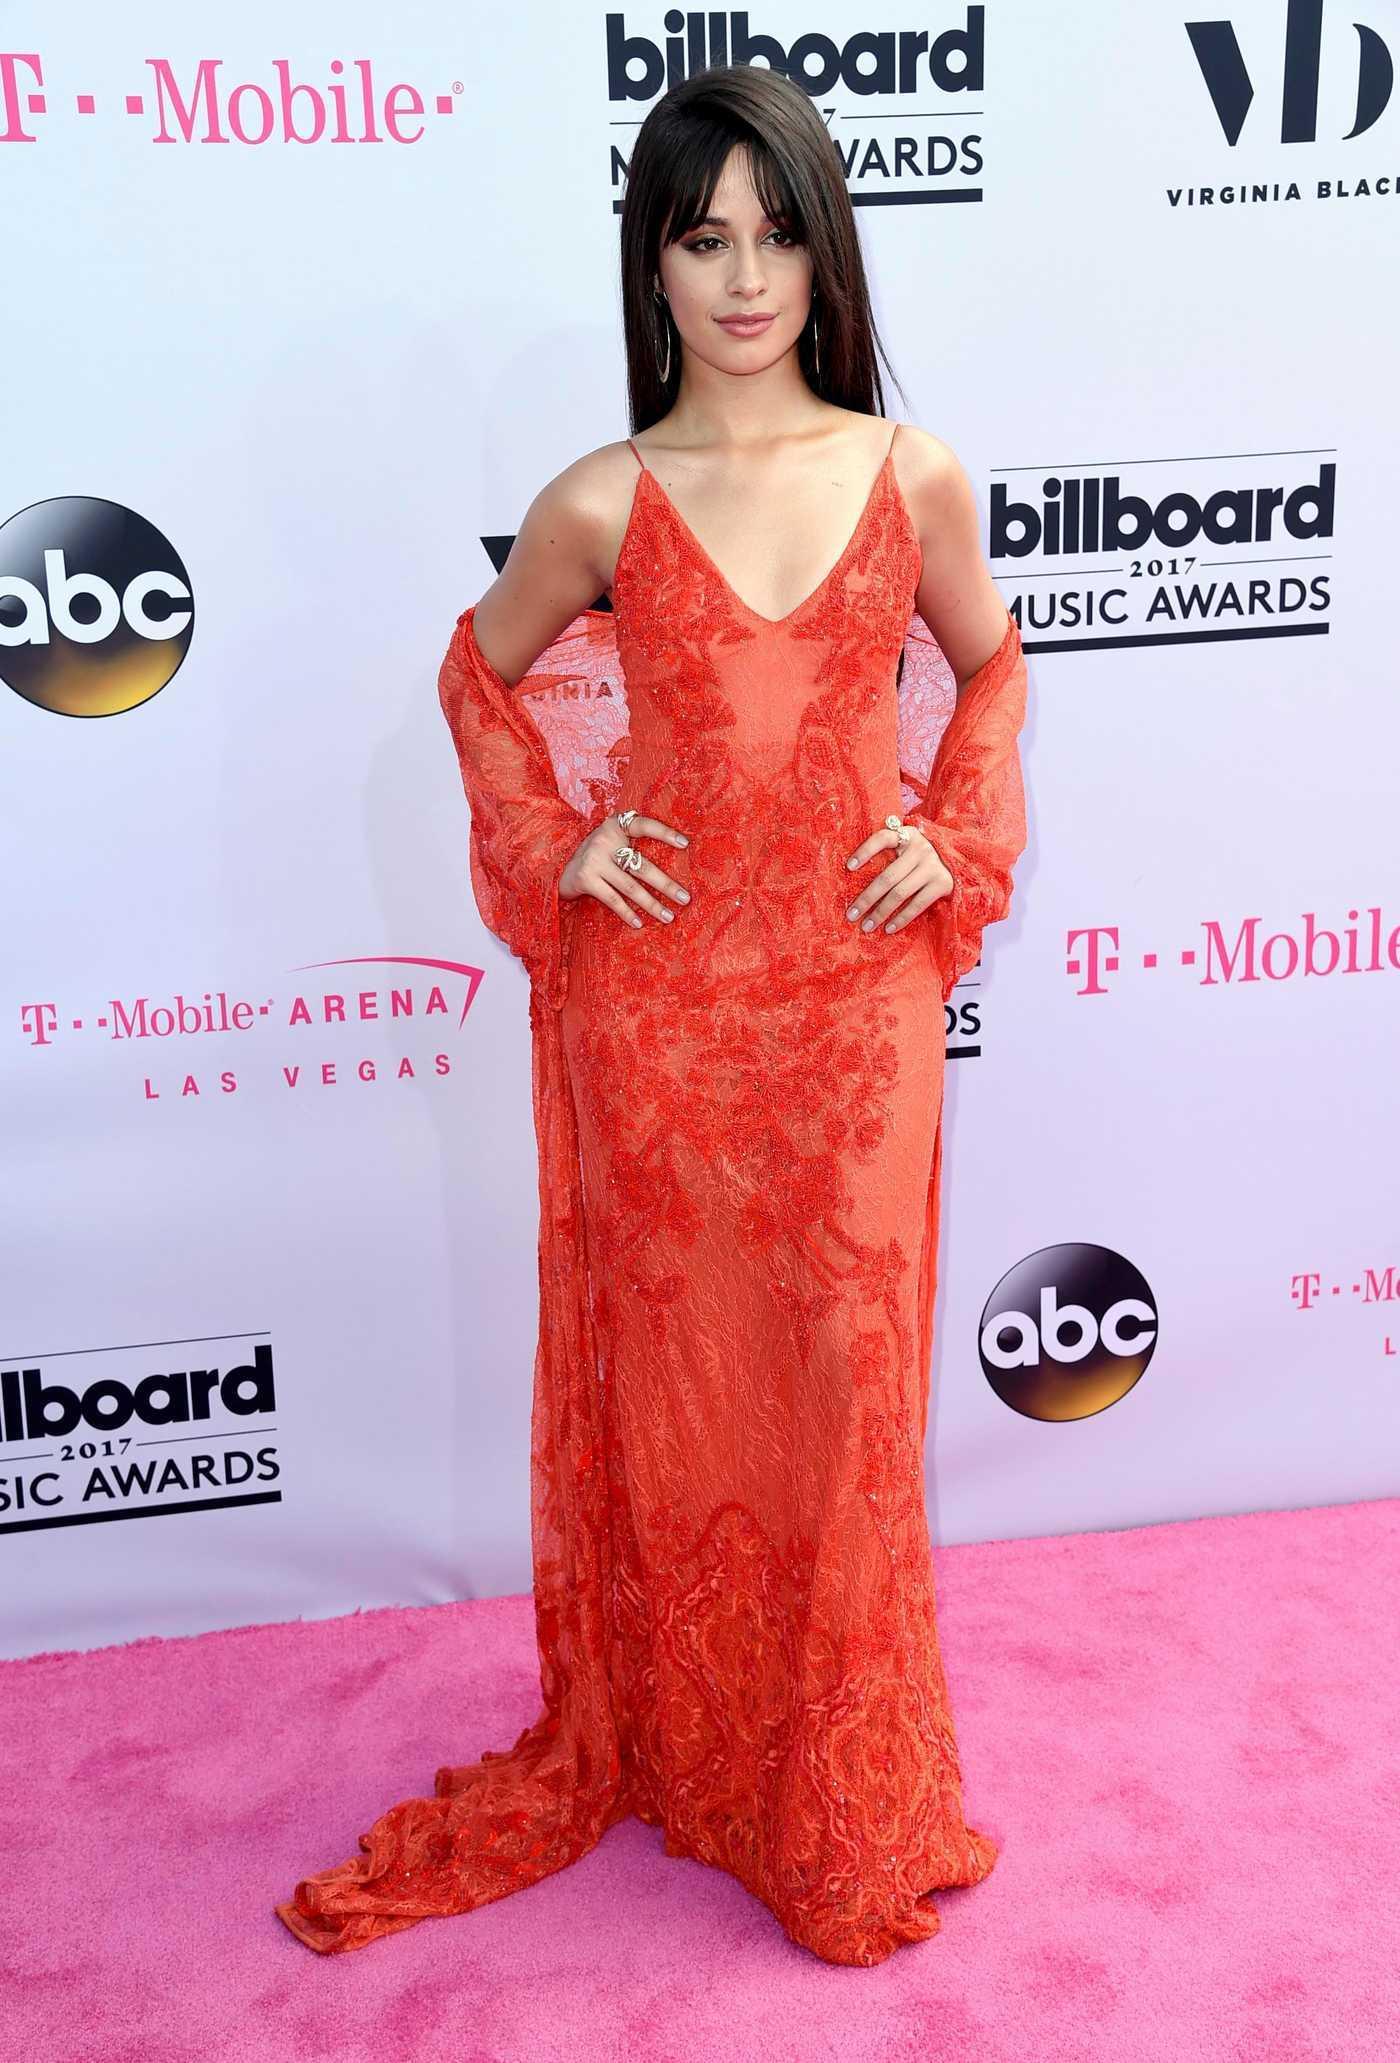 Camila Cabello at the 2017 Billboard Music Awards in Las Vegas 05/21/2017